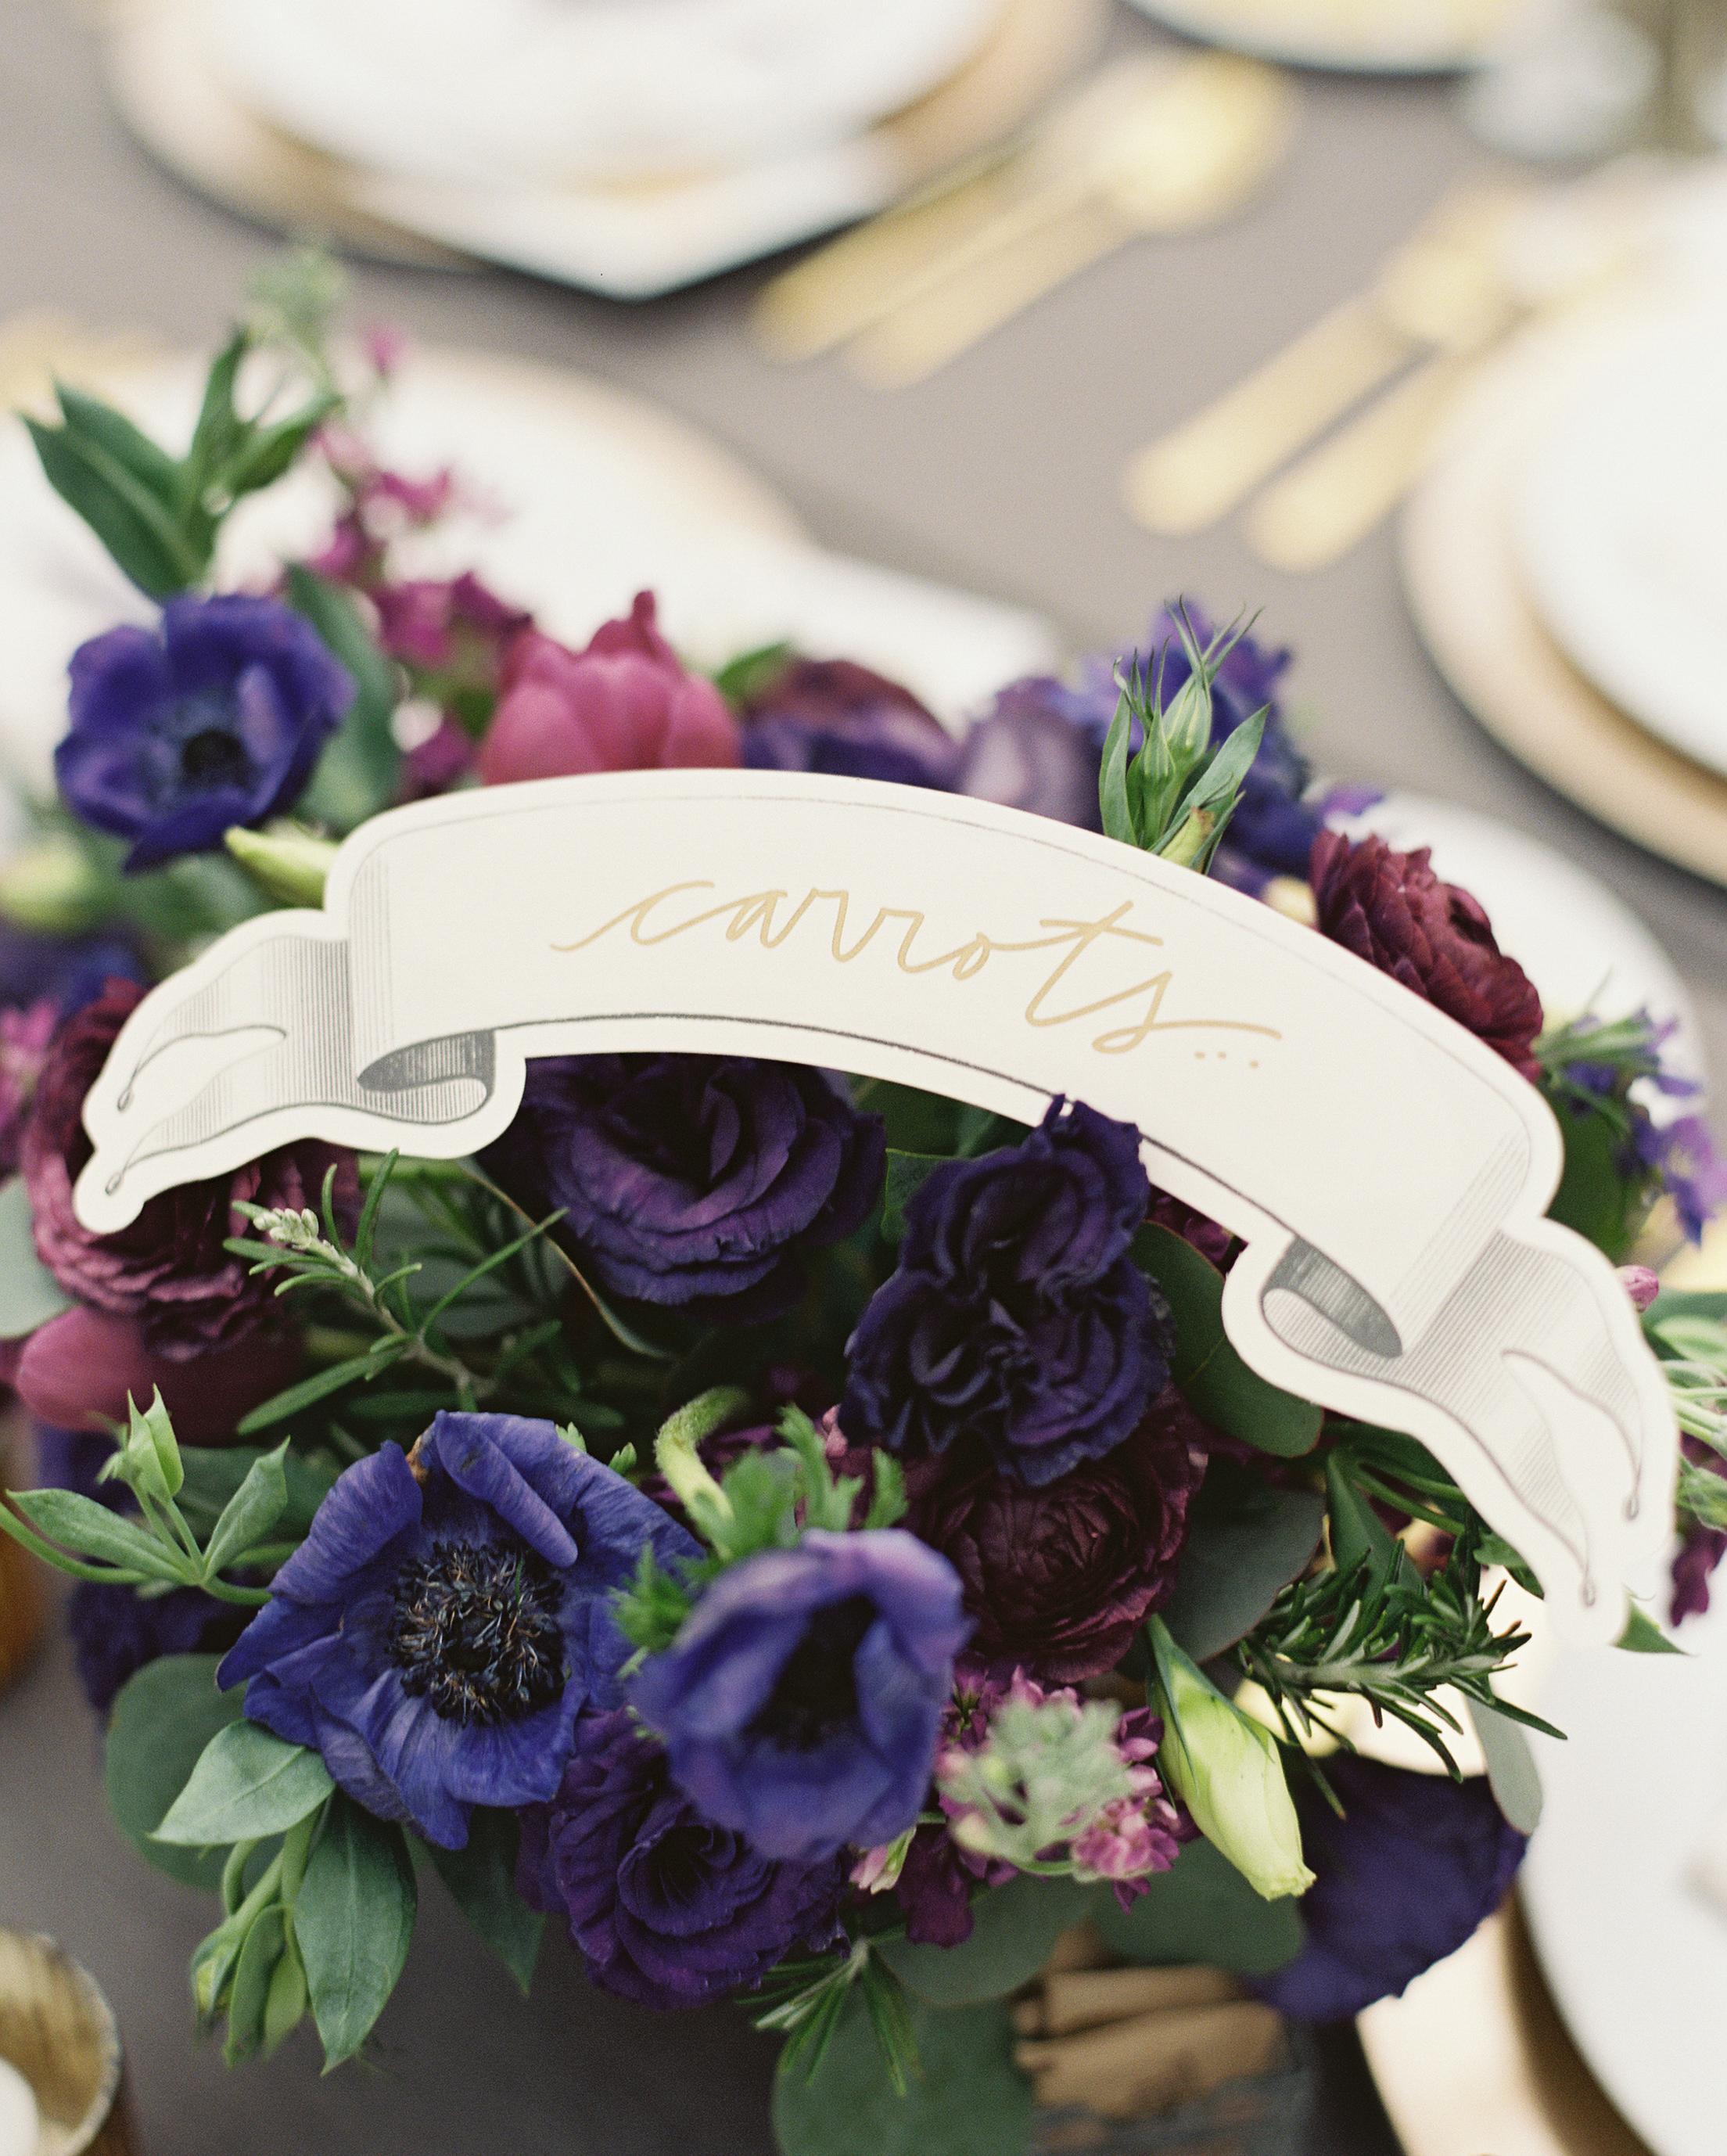 stacey-adam-wedding-tablename-0064-s112112-0815.jpg